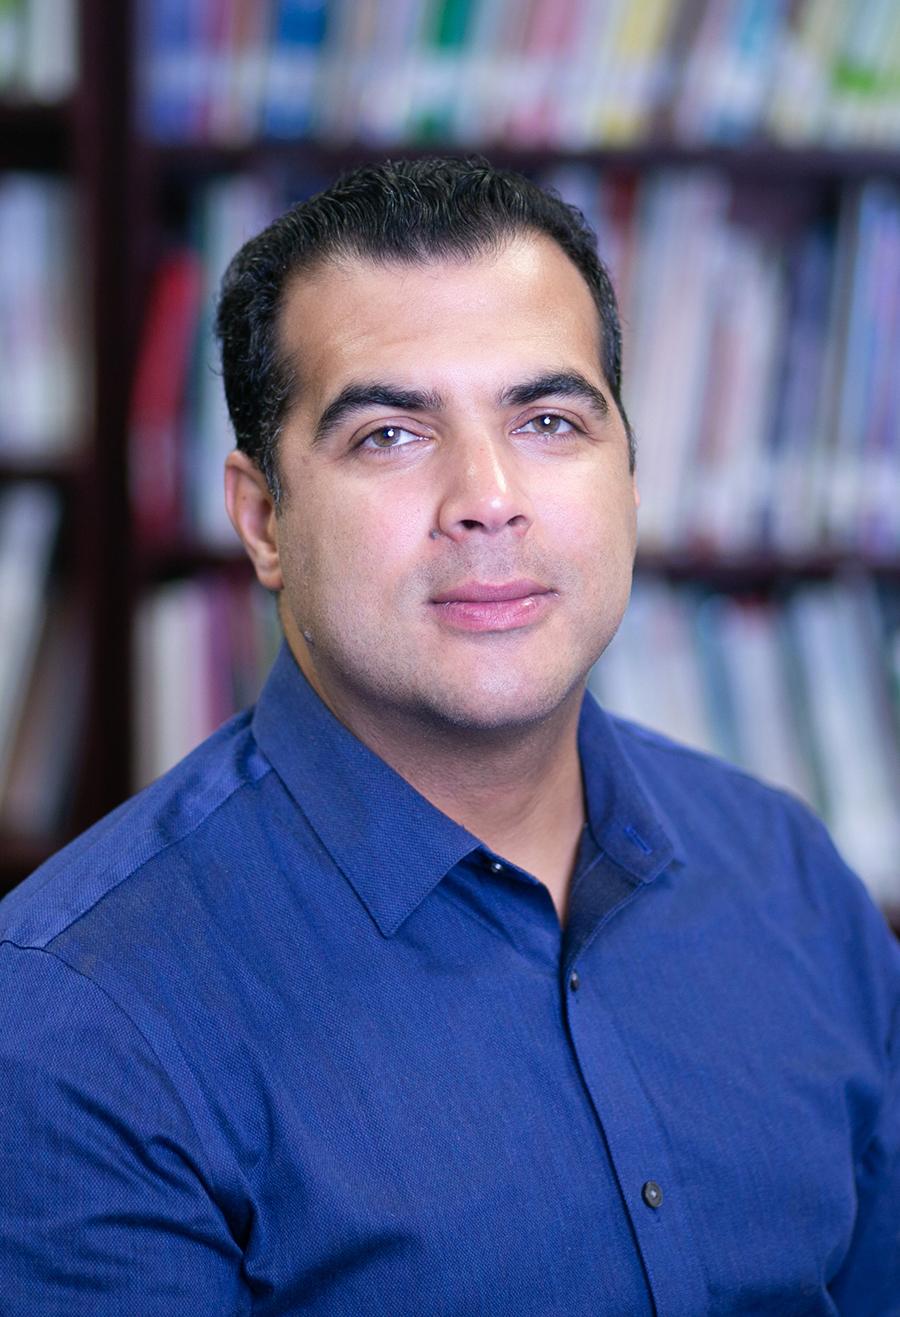 Mr. R. Fernandez